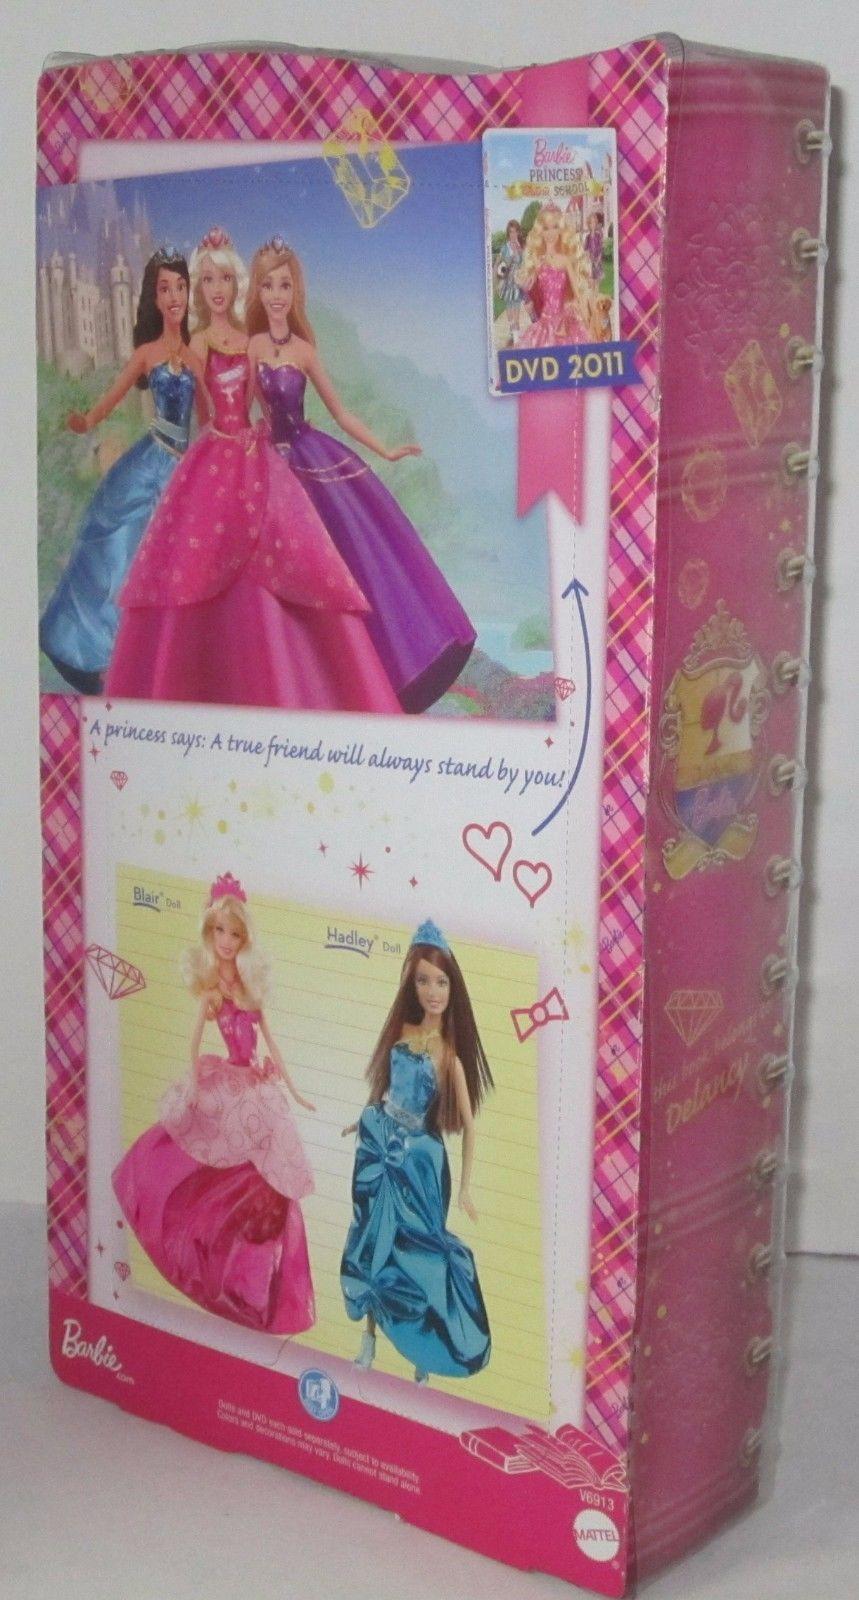 2011 Barbie Princess Charm School: School Girl Schoolgirl Princess Delancy Doll by Mattel Love the Tiara